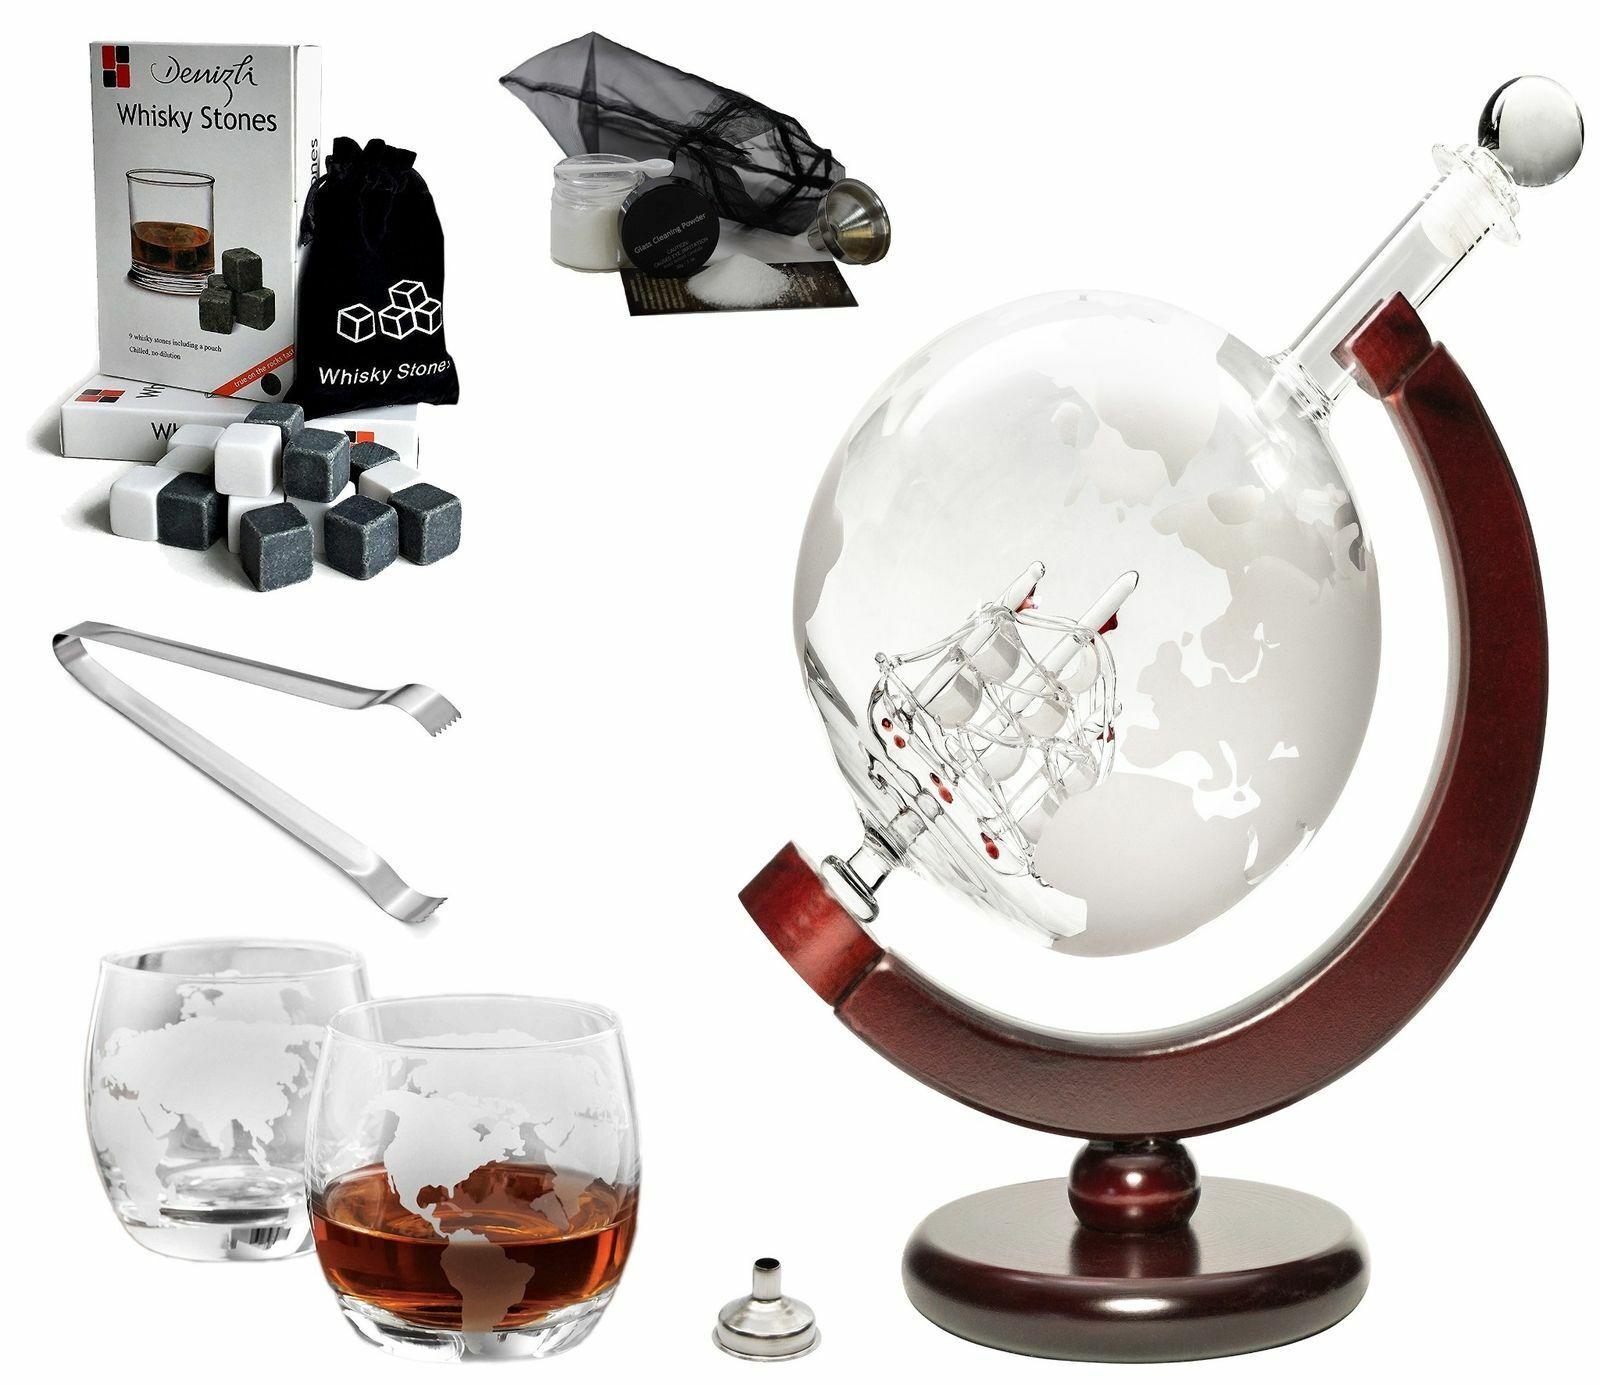 50 Oz 'Ship' Handmade Whisky Etched Globe Decanter Mega Set with Globe Glasses